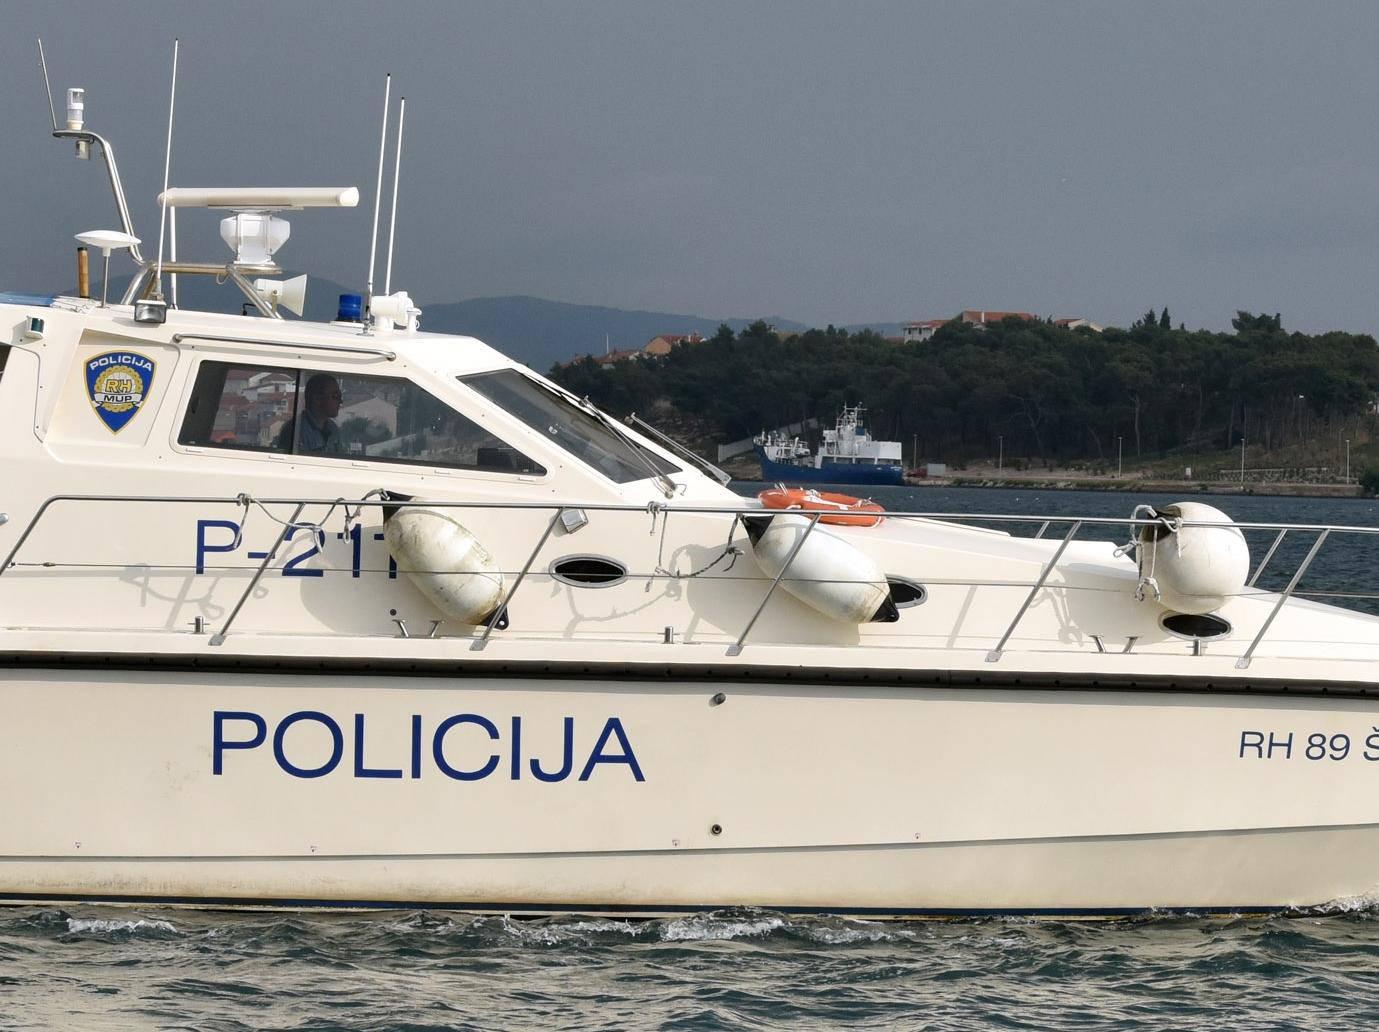 Utopio se turist (24) kod Pule: 'Oživljavali su ga sat vremena'